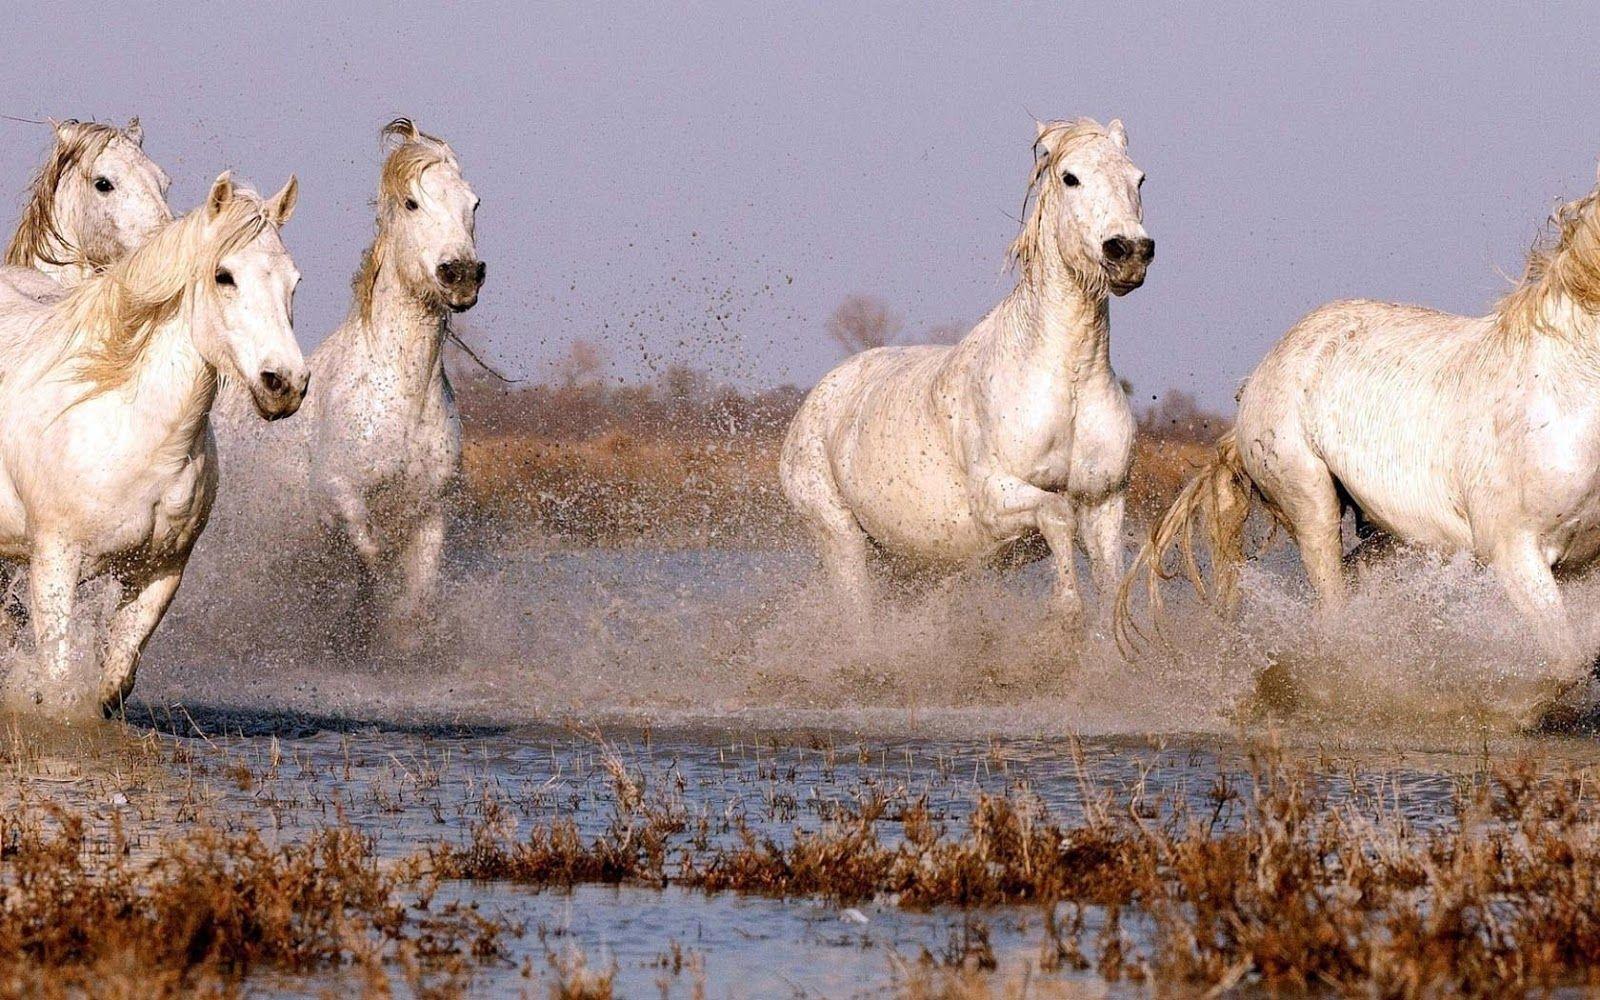 Must see Wallpaper Horse Laptop - 4a89cbc151a70ebf881fab08fa3bf30a  HD_833020.jpg